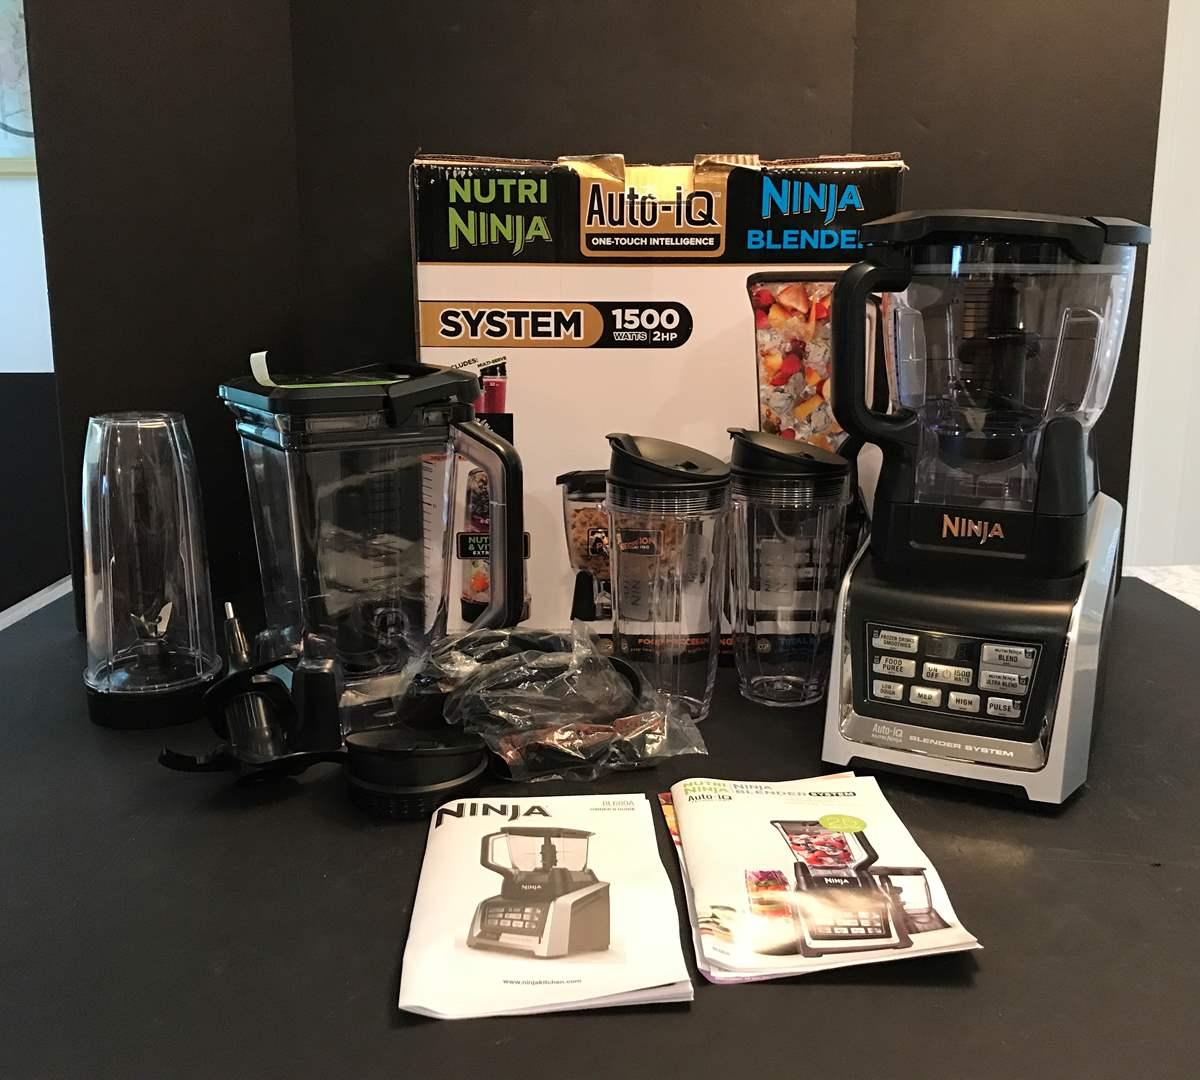 Lot # 62 - New Auto-IQ Nutri Ninja Blender System Model #BL680A (main image)